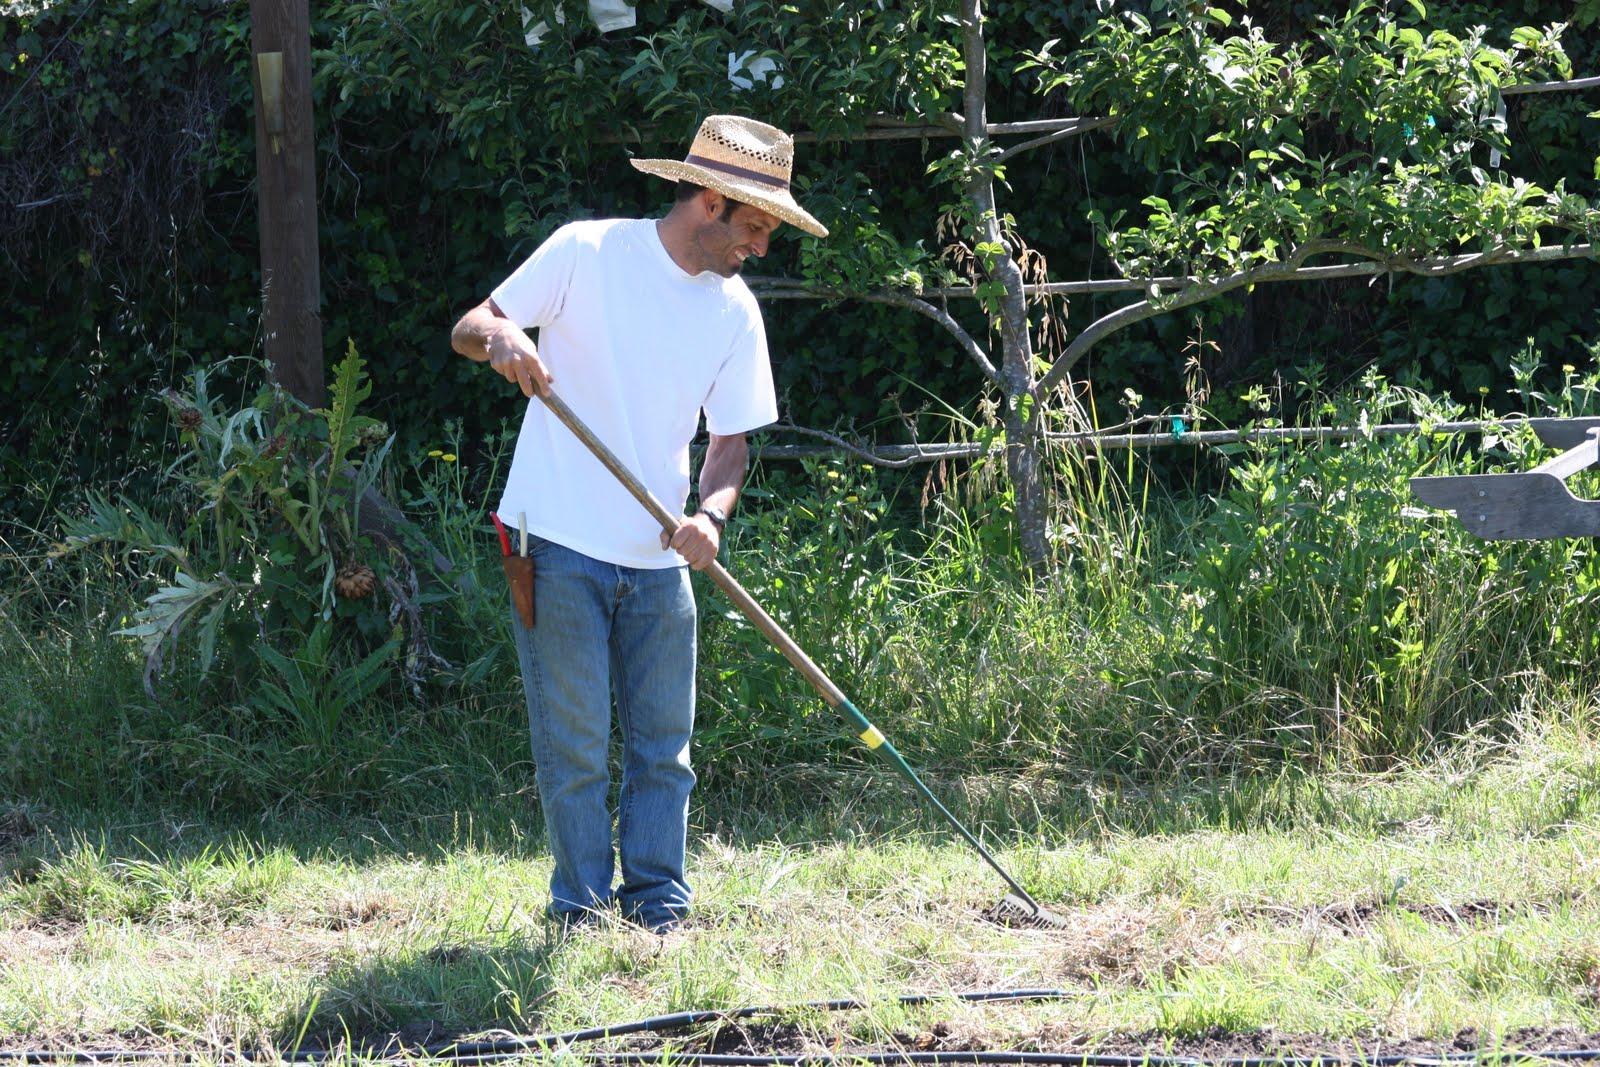 geoff the cheerful gardener shows off expert raking technique